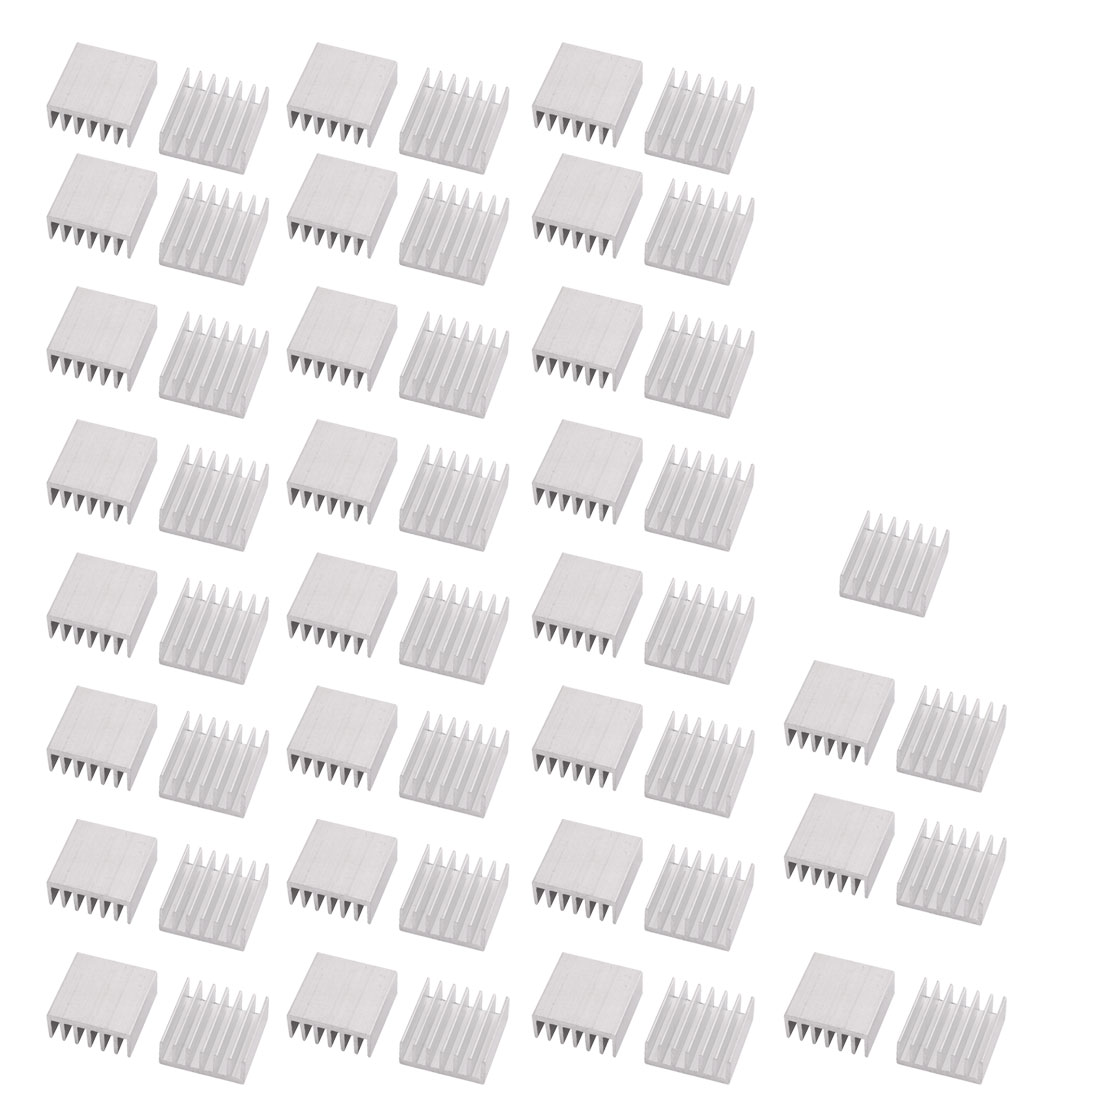 55Pcs 14x14x6mm Aluminium Heats Dissipate Cooling Fin Cooler Silver Tone